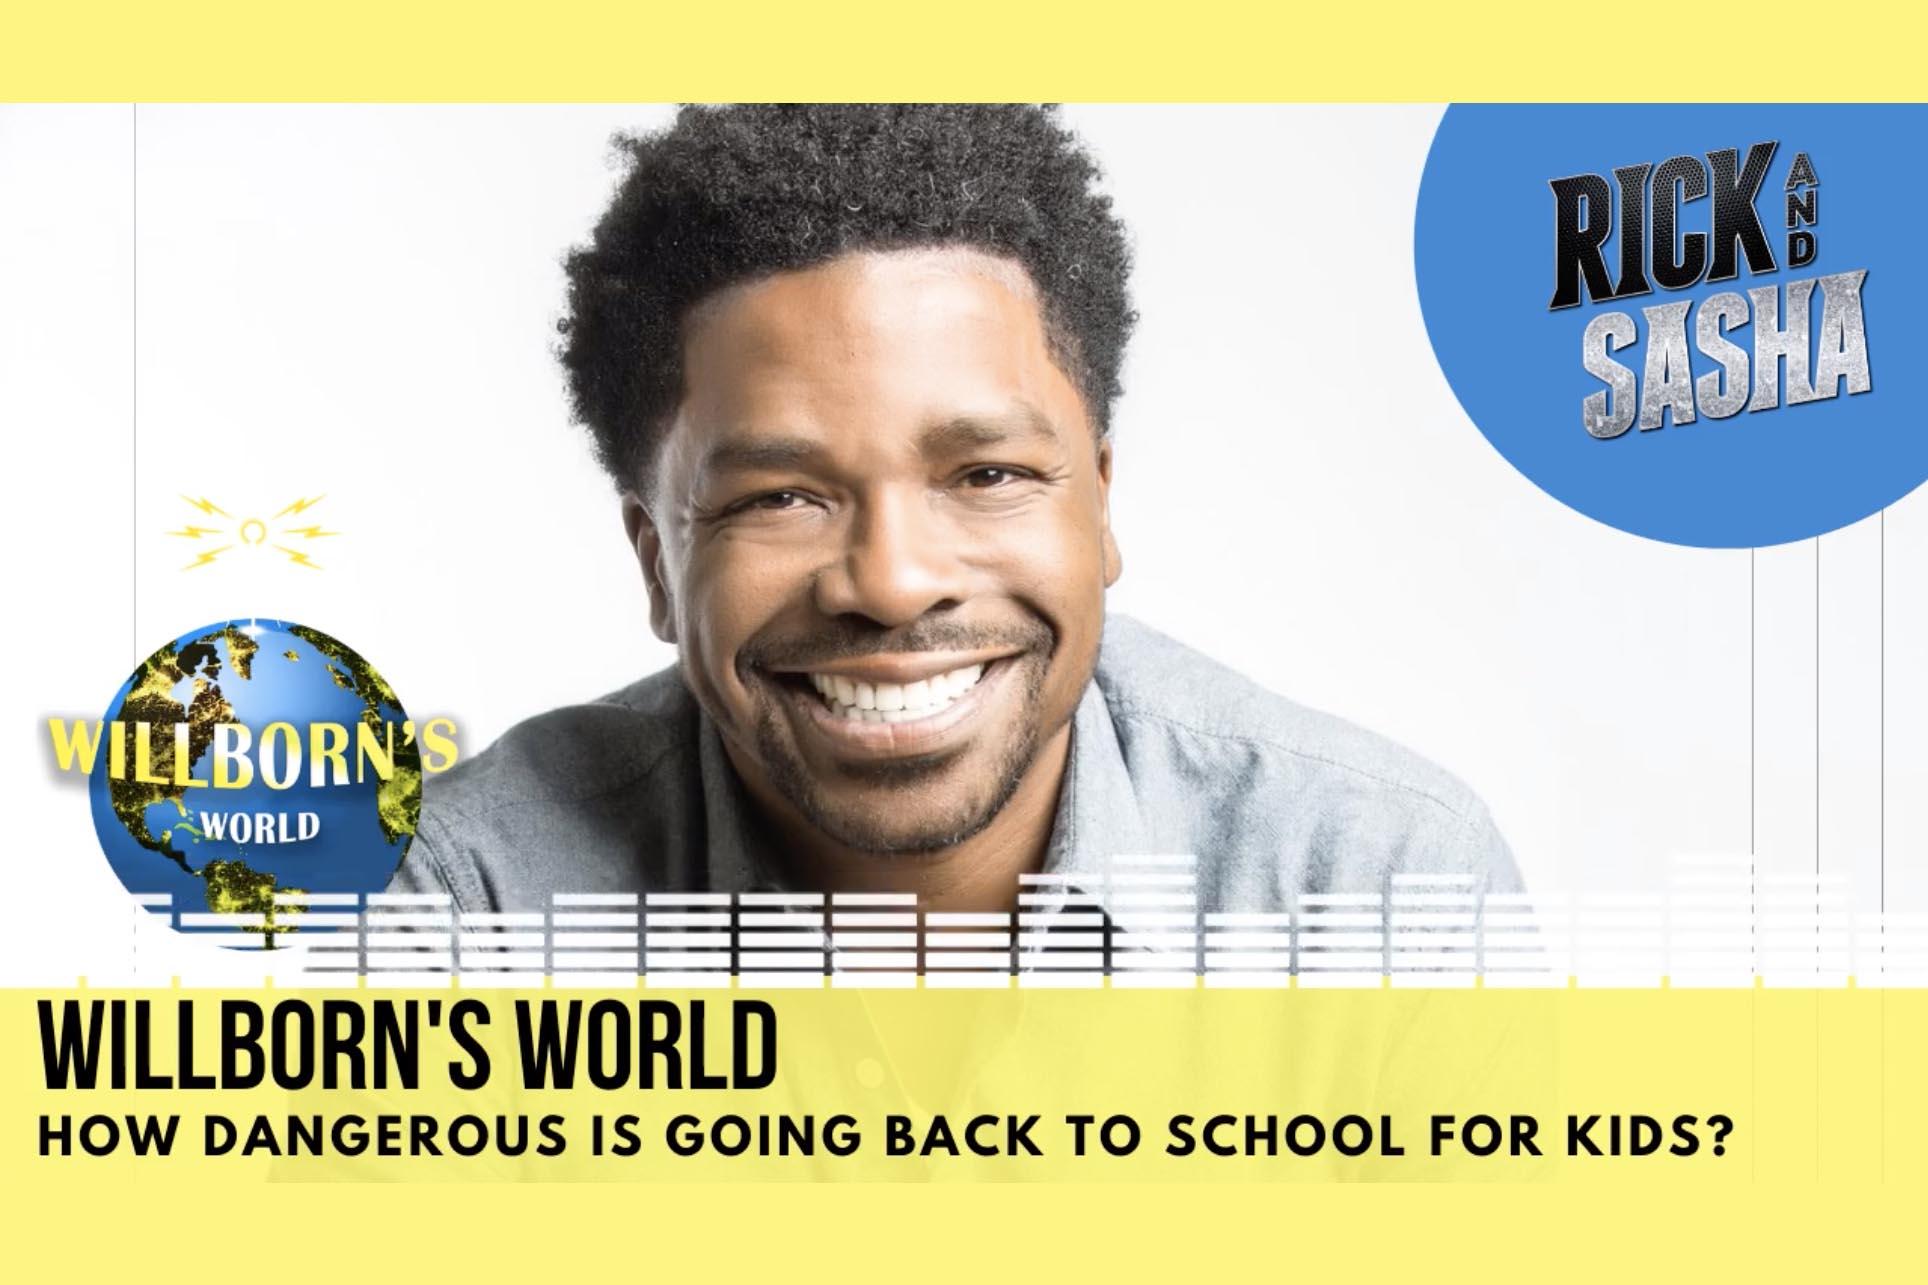 Willborn's World: The Danger of Going Back to School